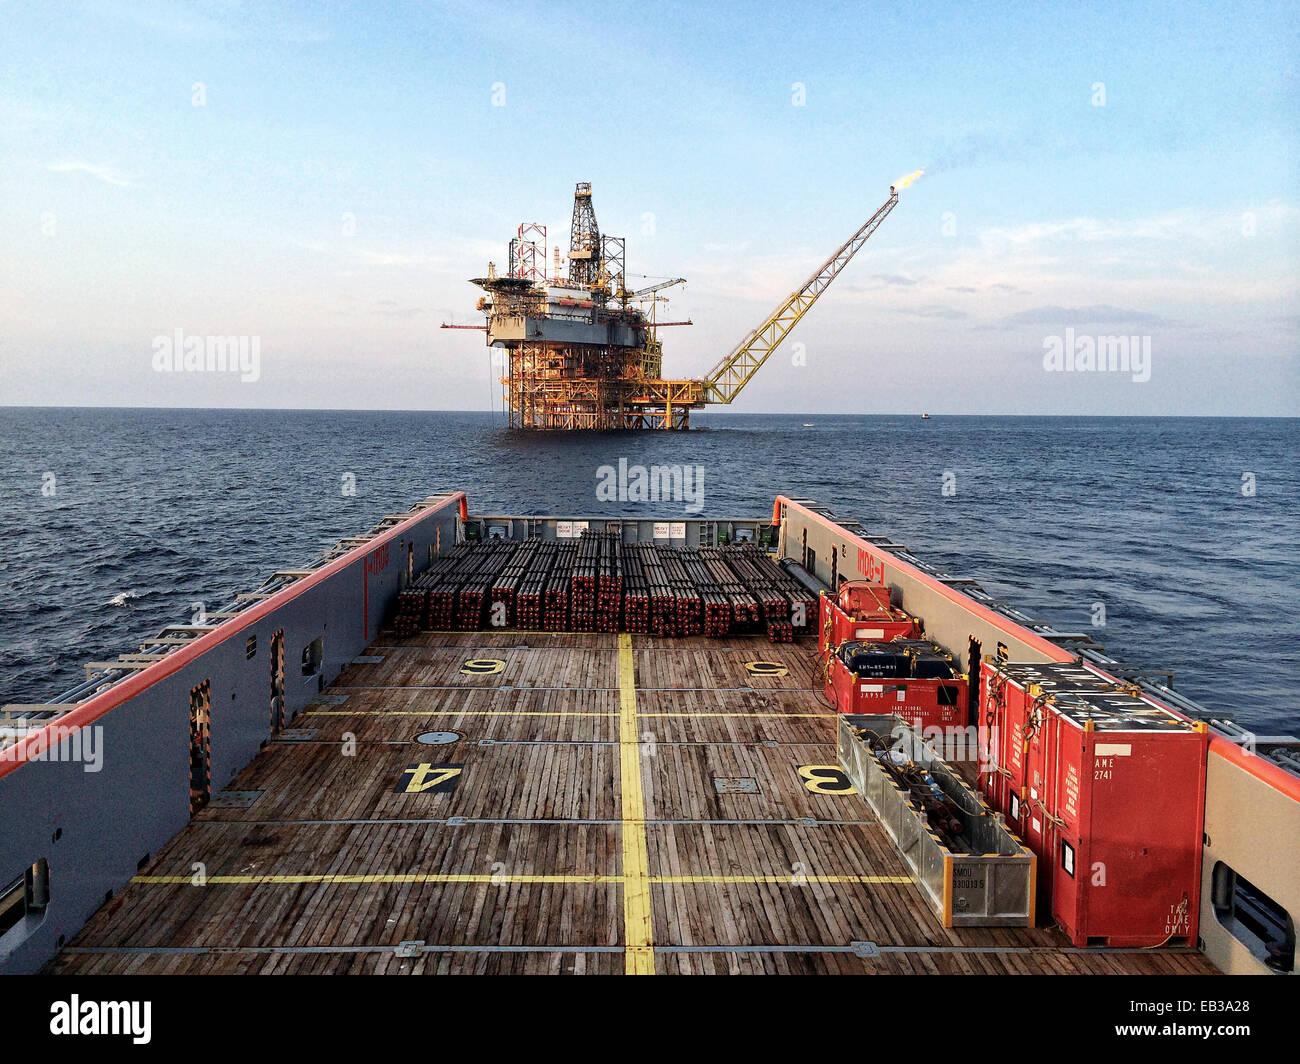 Oil platform seen from main deck of platform supply vessel - Stock Image